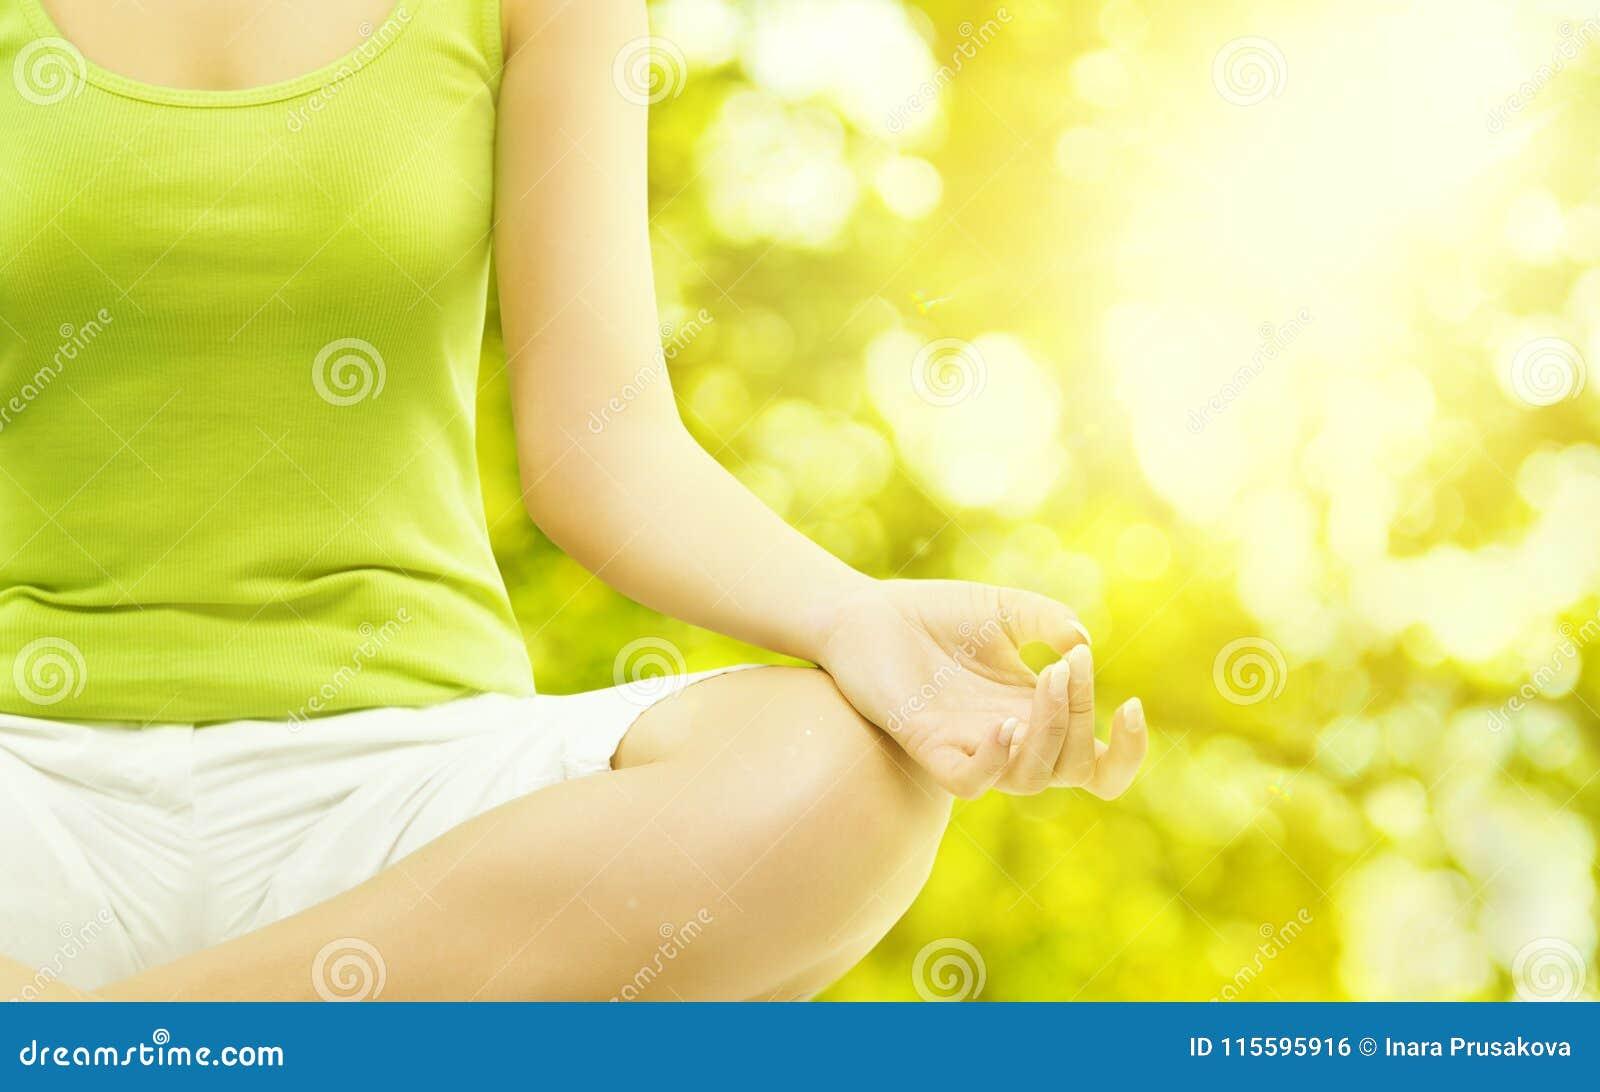 Yoga Outdoor Meditation, Woman Body Meditating, Human Hand